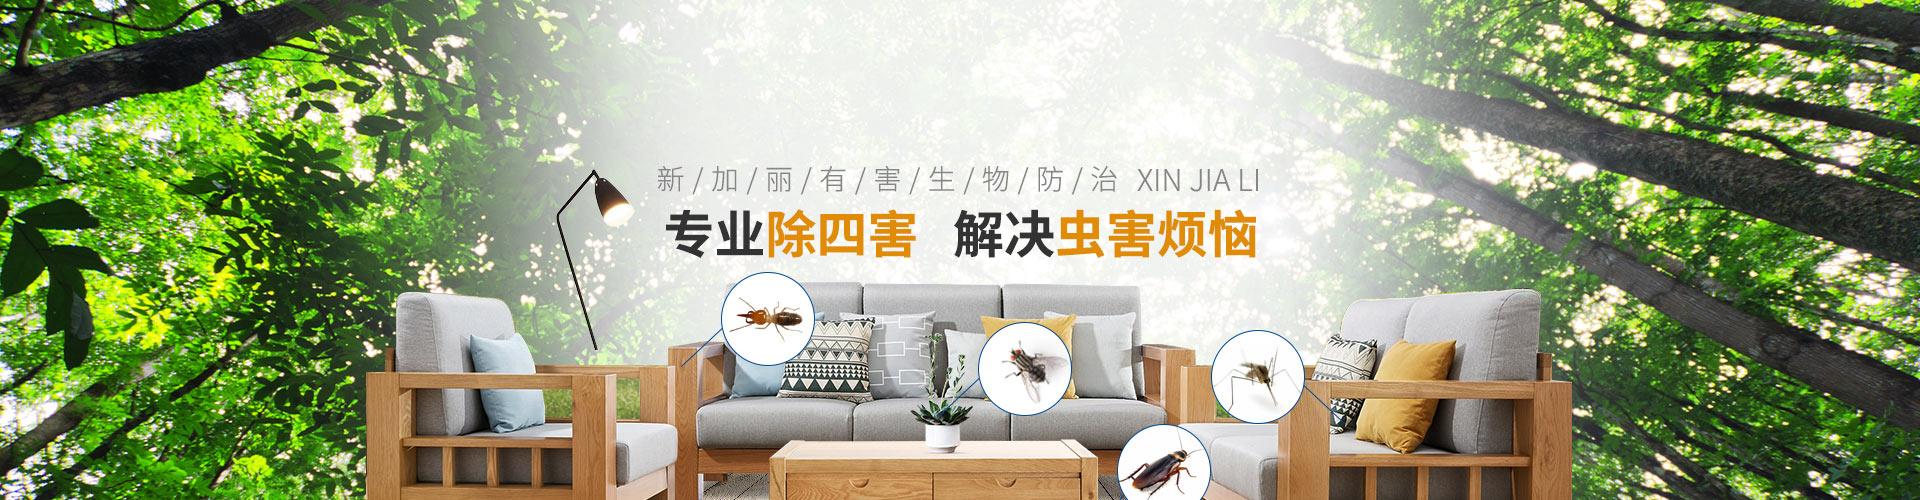 http://www.cqxjl.com.cn/data/upload/202103/20210309163509_668.jpg